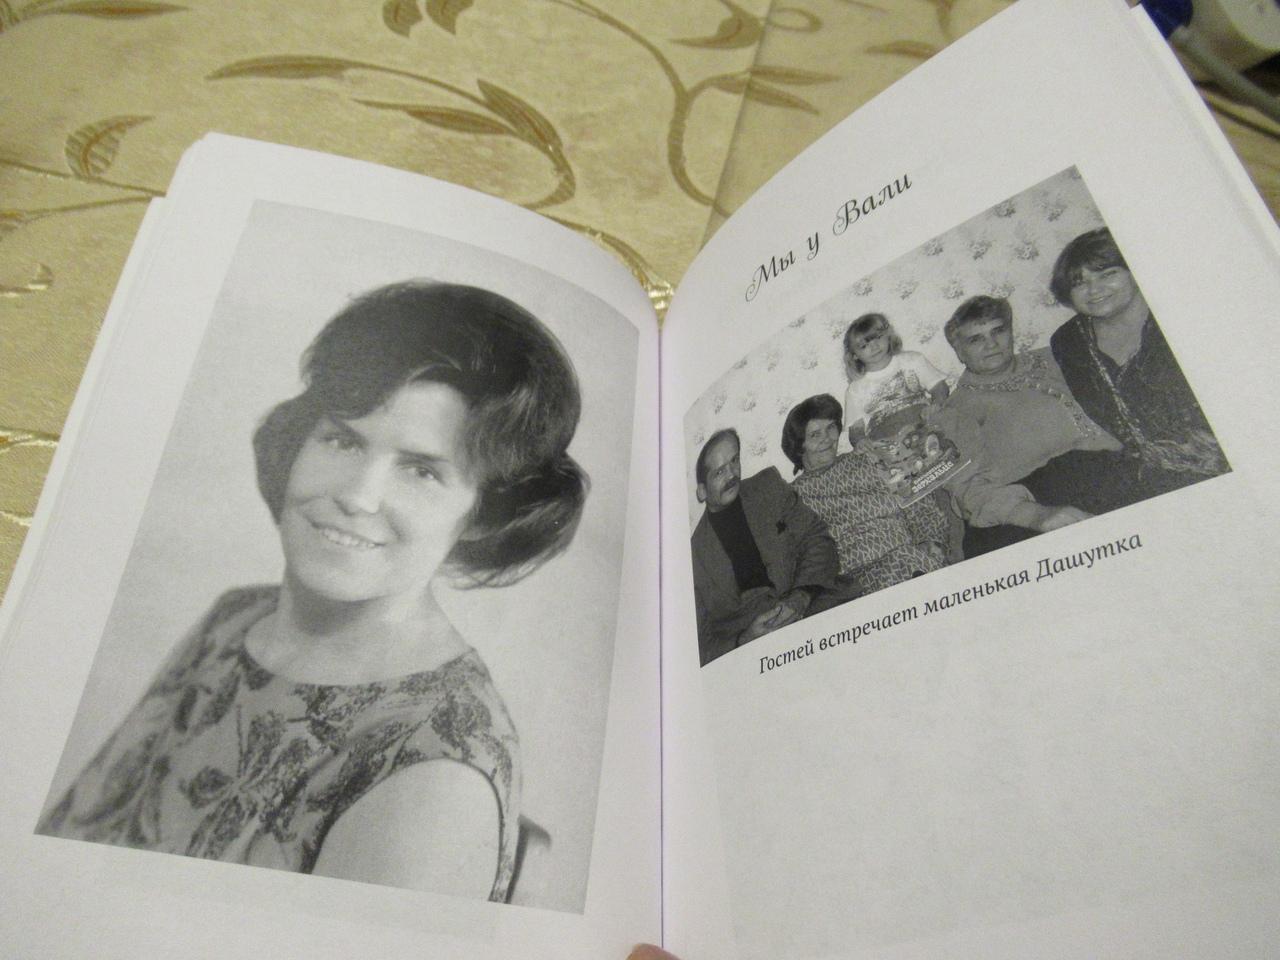 Записная книжка Натальи - Страница 40 7Mcwzm1fFKk